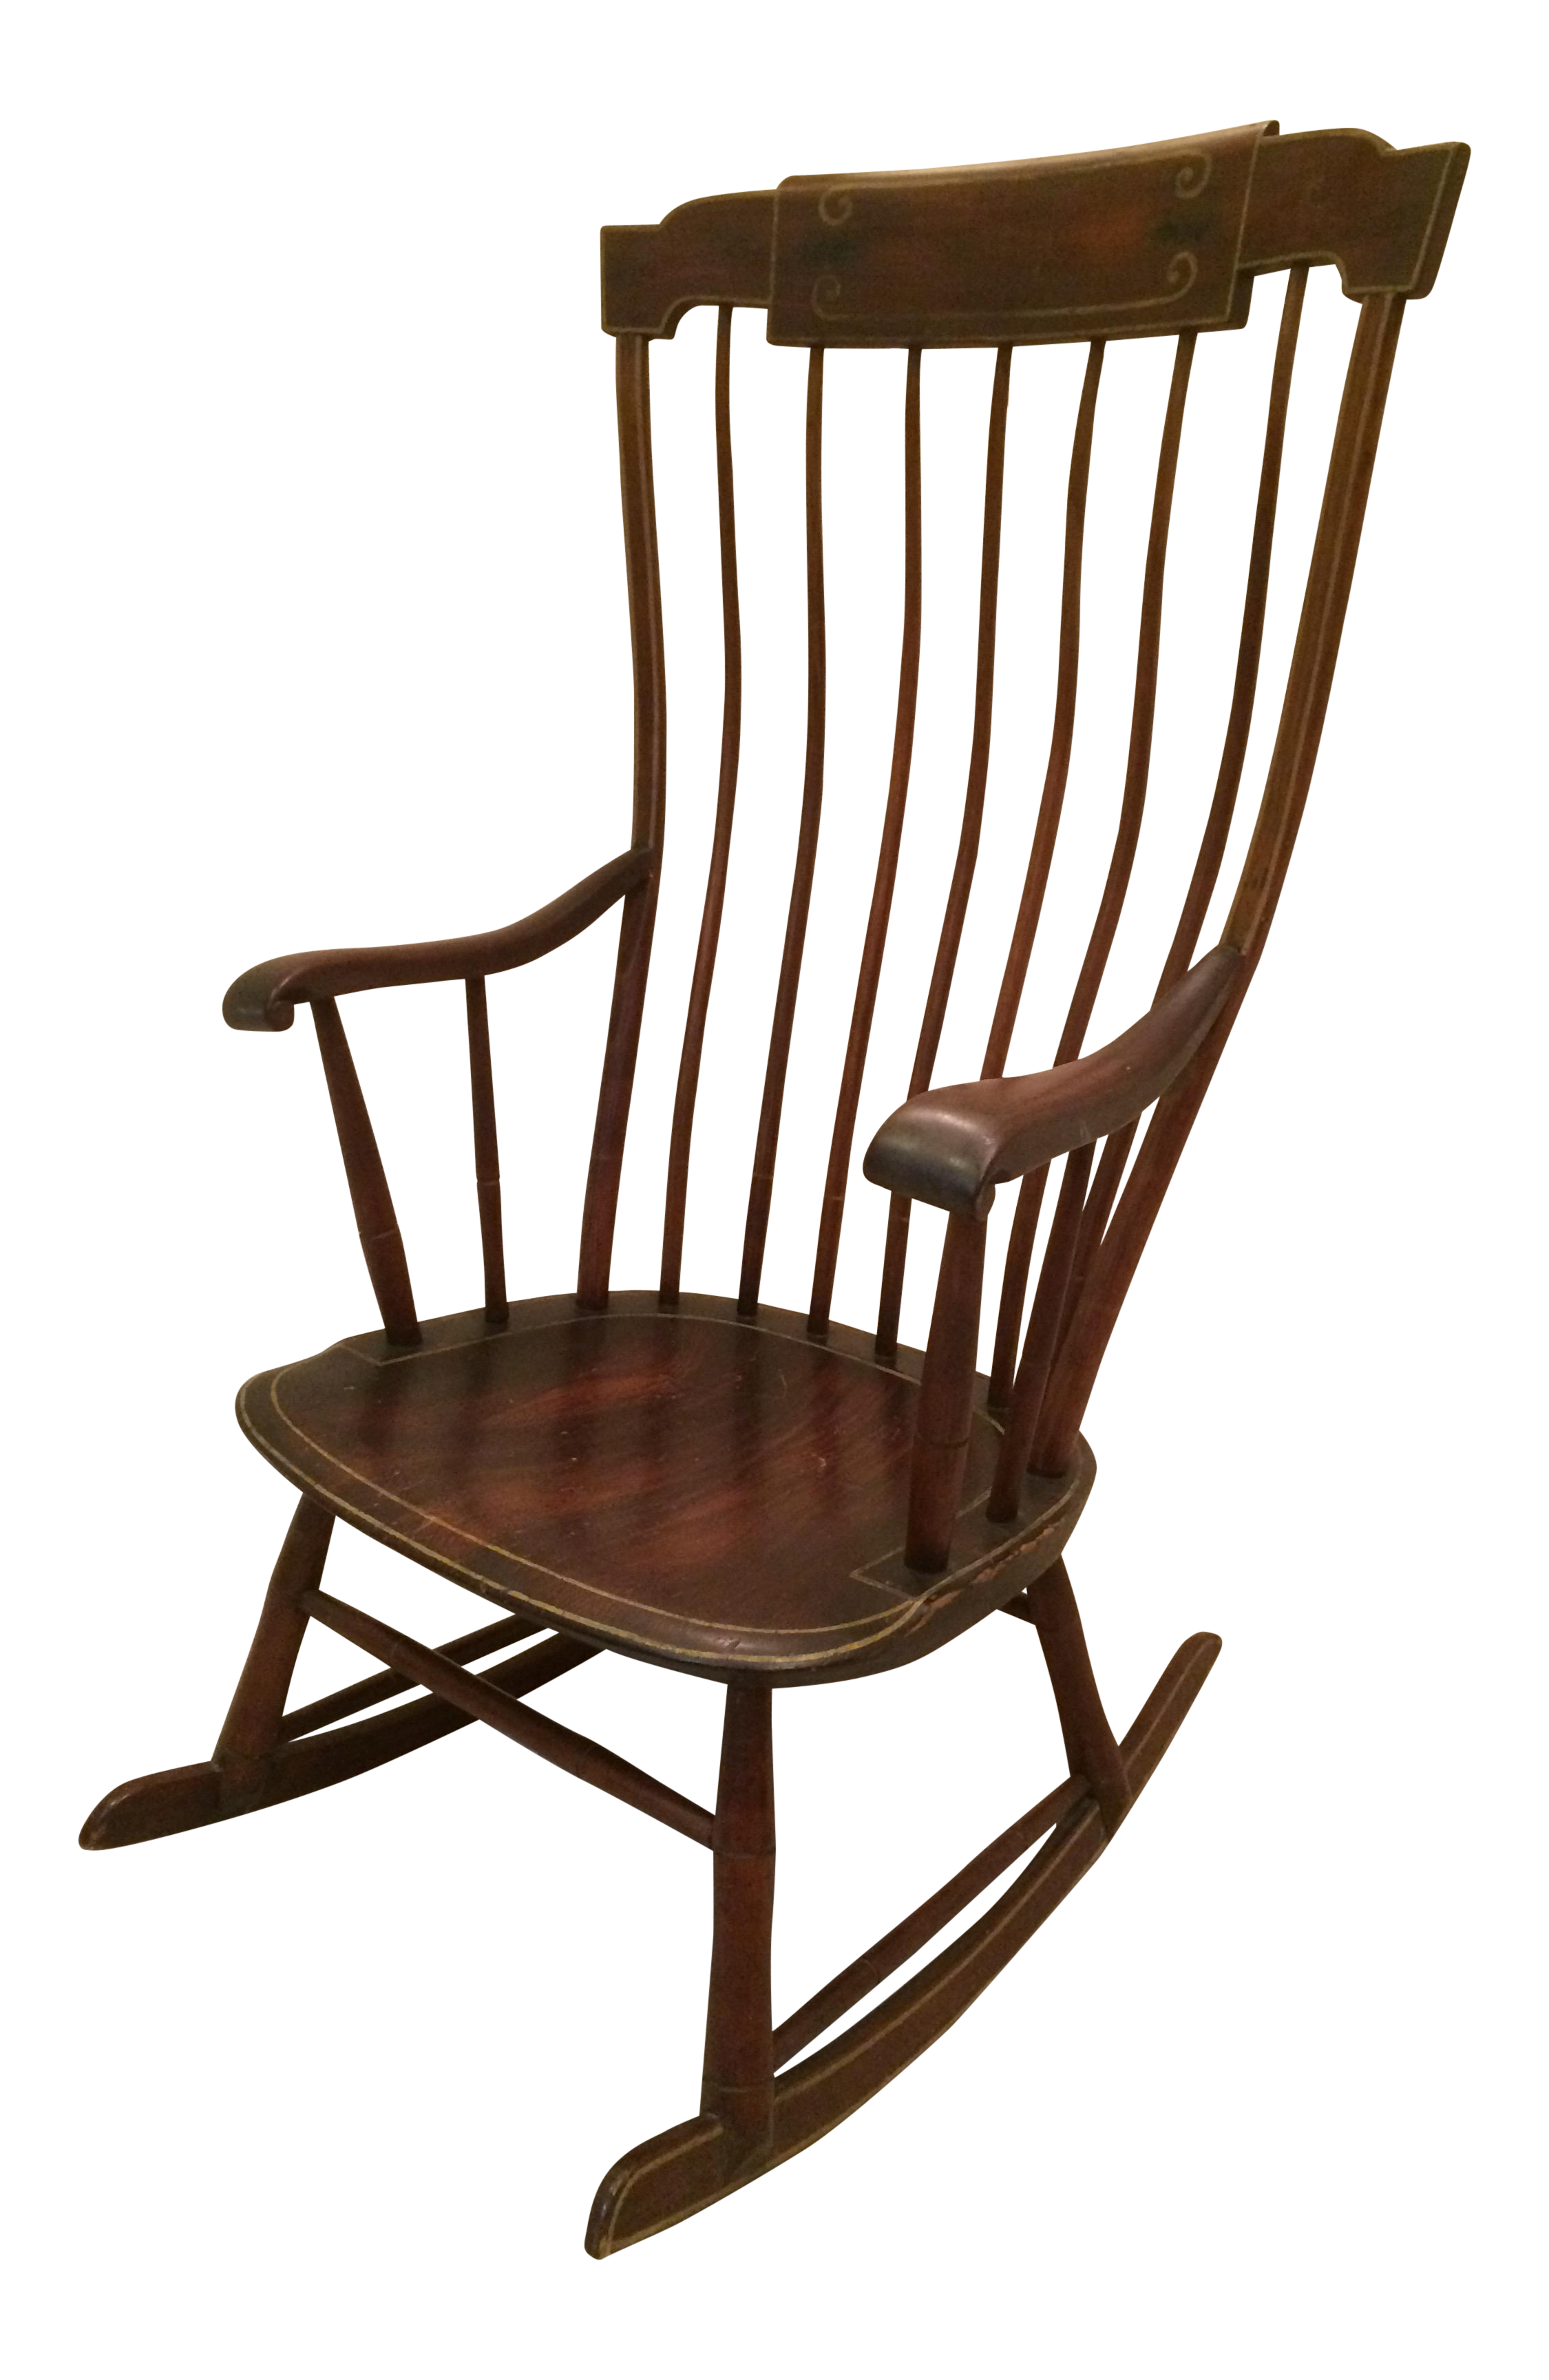 Antique Federal Period Boston Windsor Rocking Chair